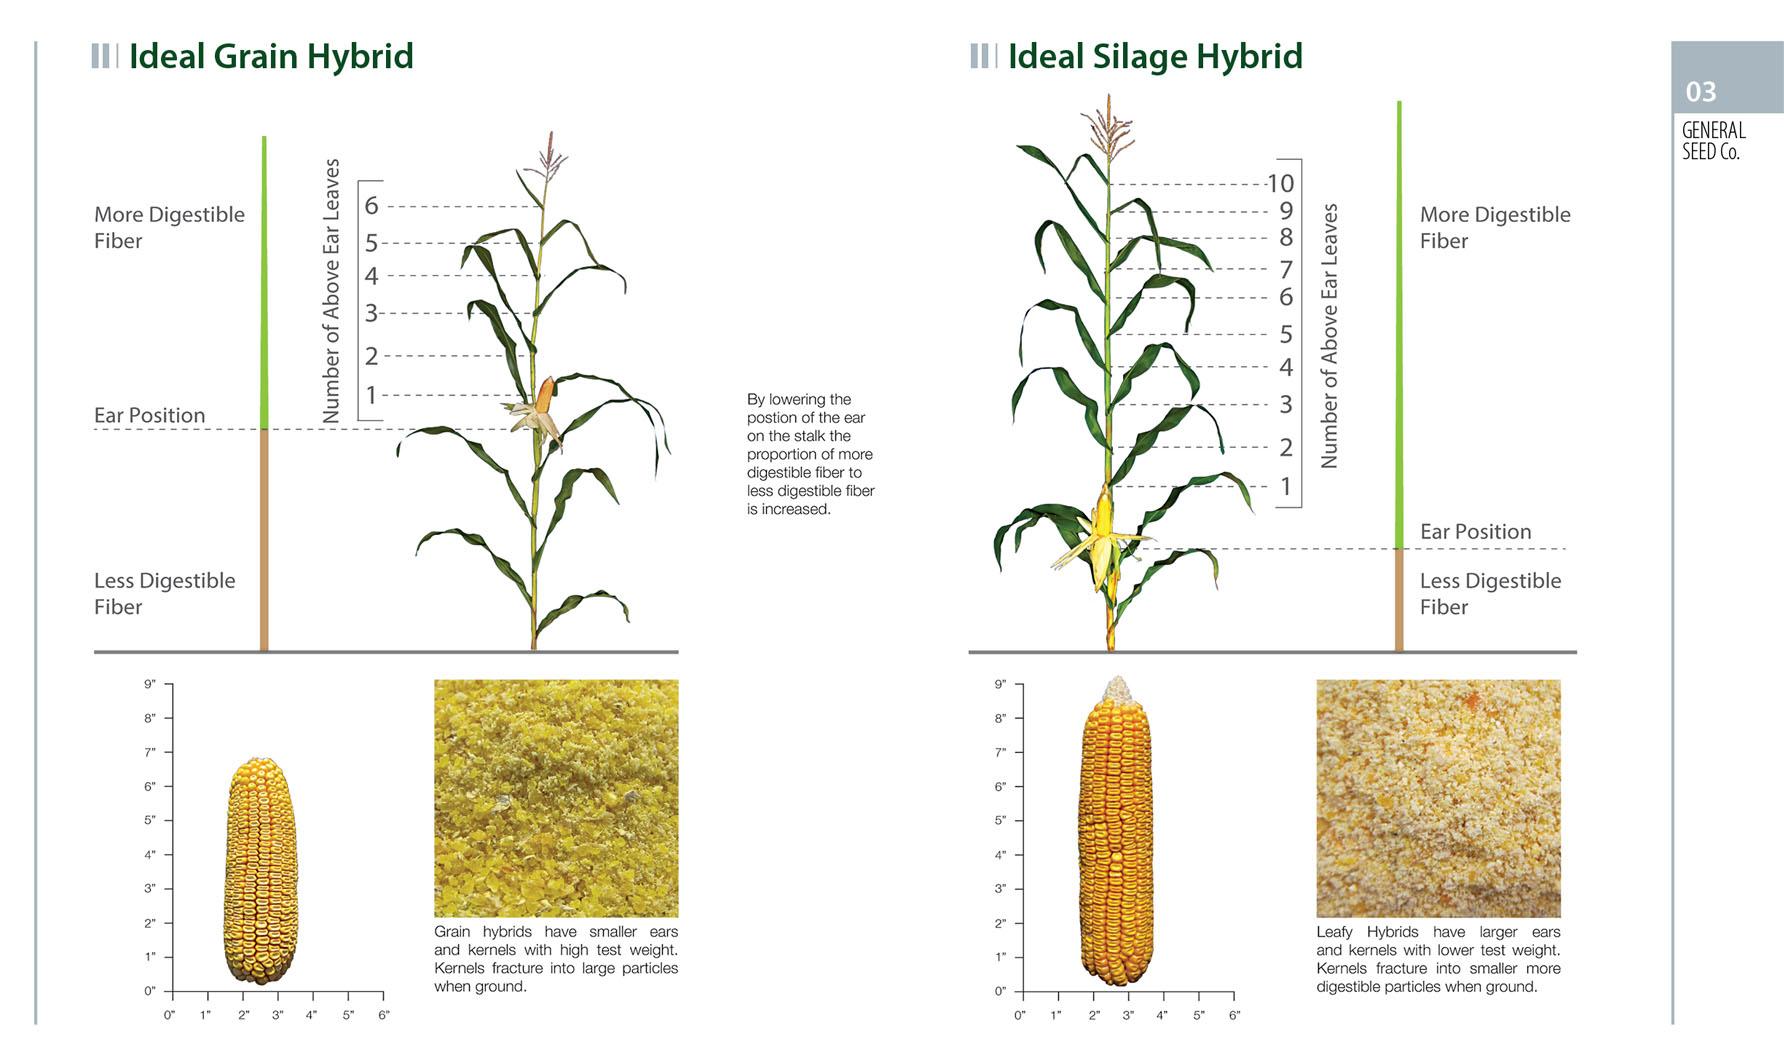 GSL Silage Hybrid general seed company